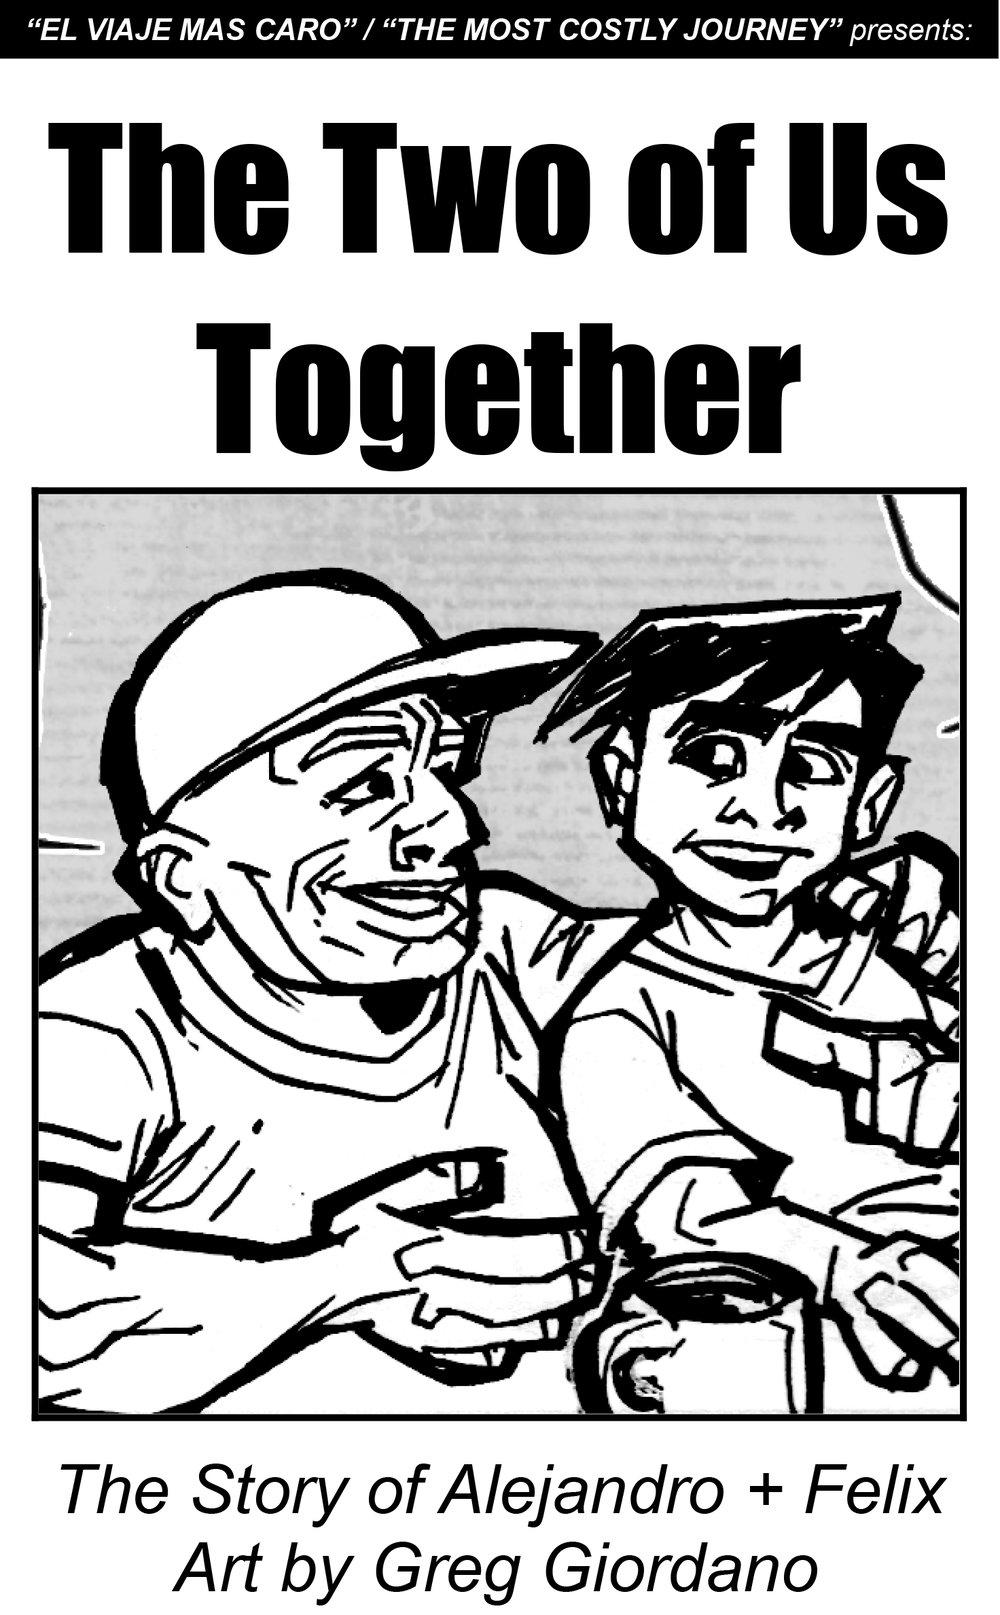 BOOKLET-Alejandro+Felix+Greg-171200-Digest_ENG 1.jpg